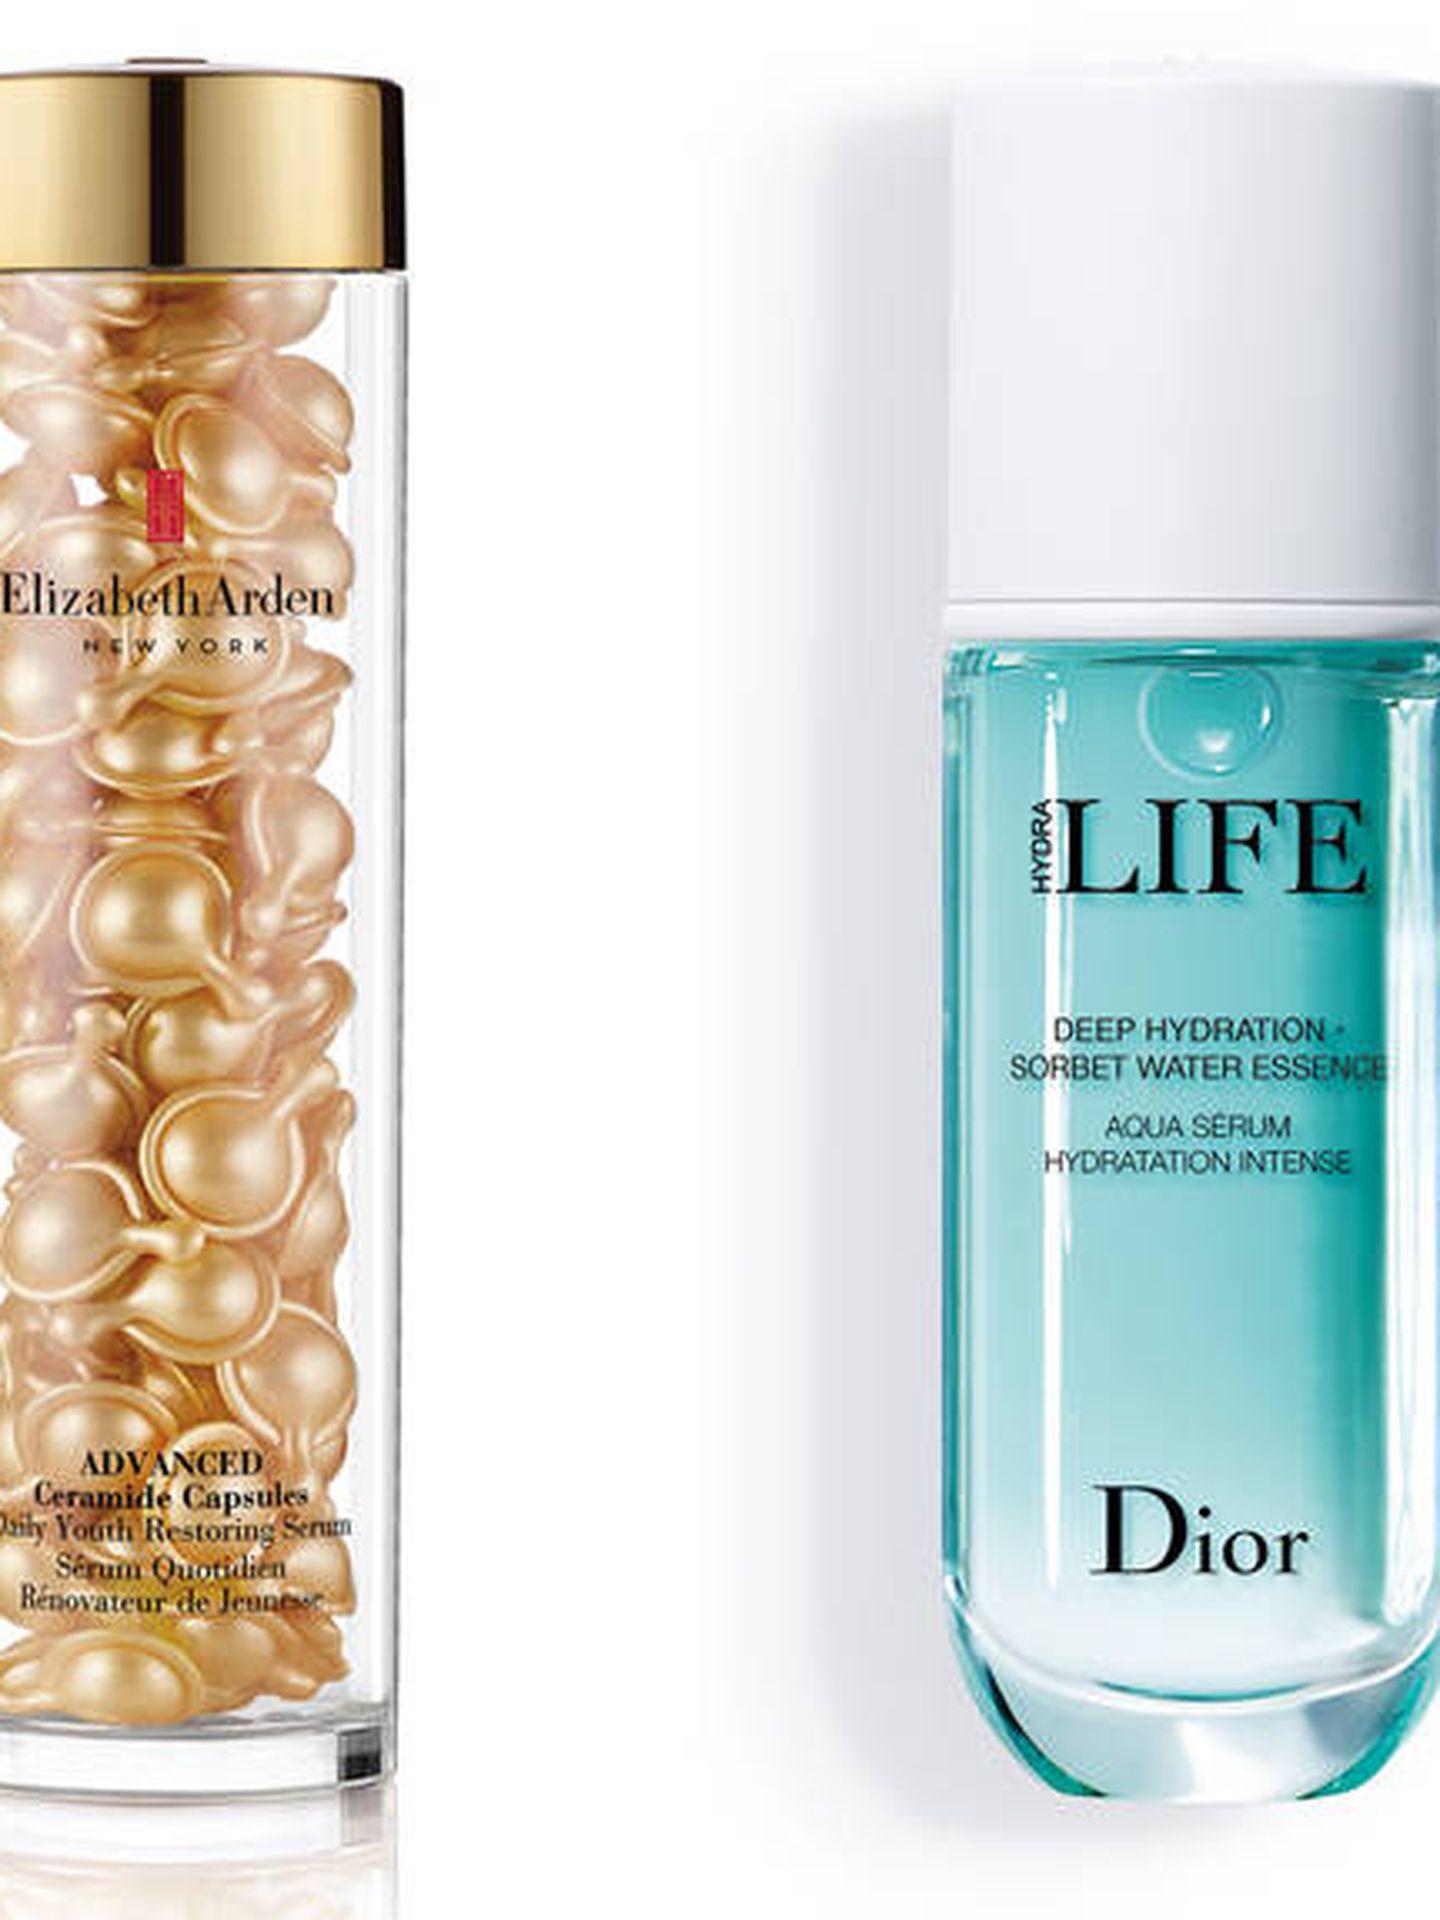 Advanced Ceramides Capsules, de Elizabeth Arden; Serum Hydra Life, de Dior; Golden Caresse Delicated Skin, de Germaine de Capuccini.